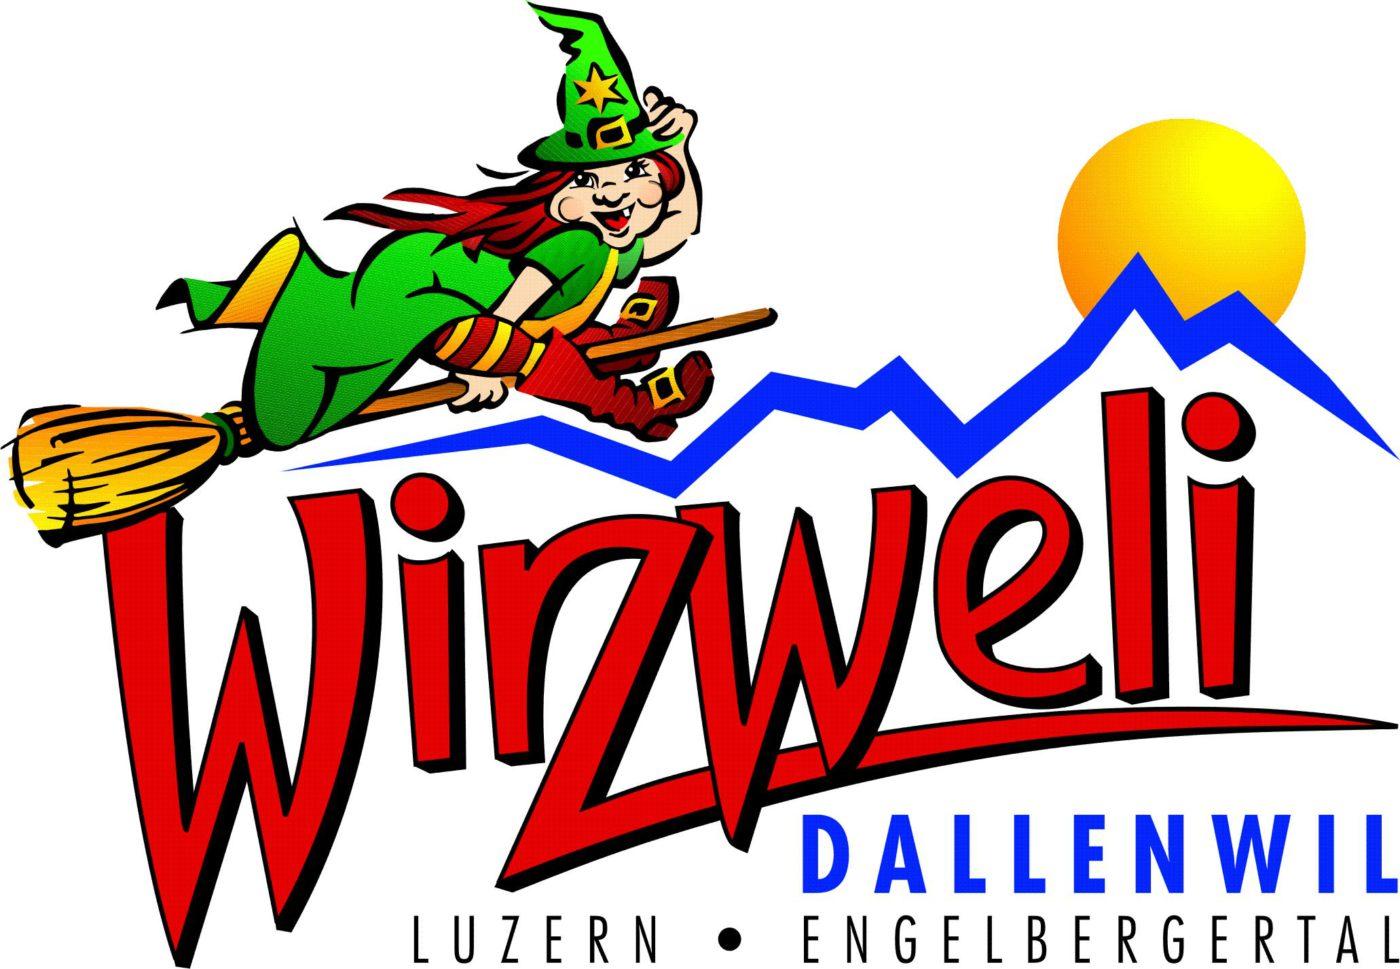 Luftseilbahn Dallenwil-Wirzweli AG